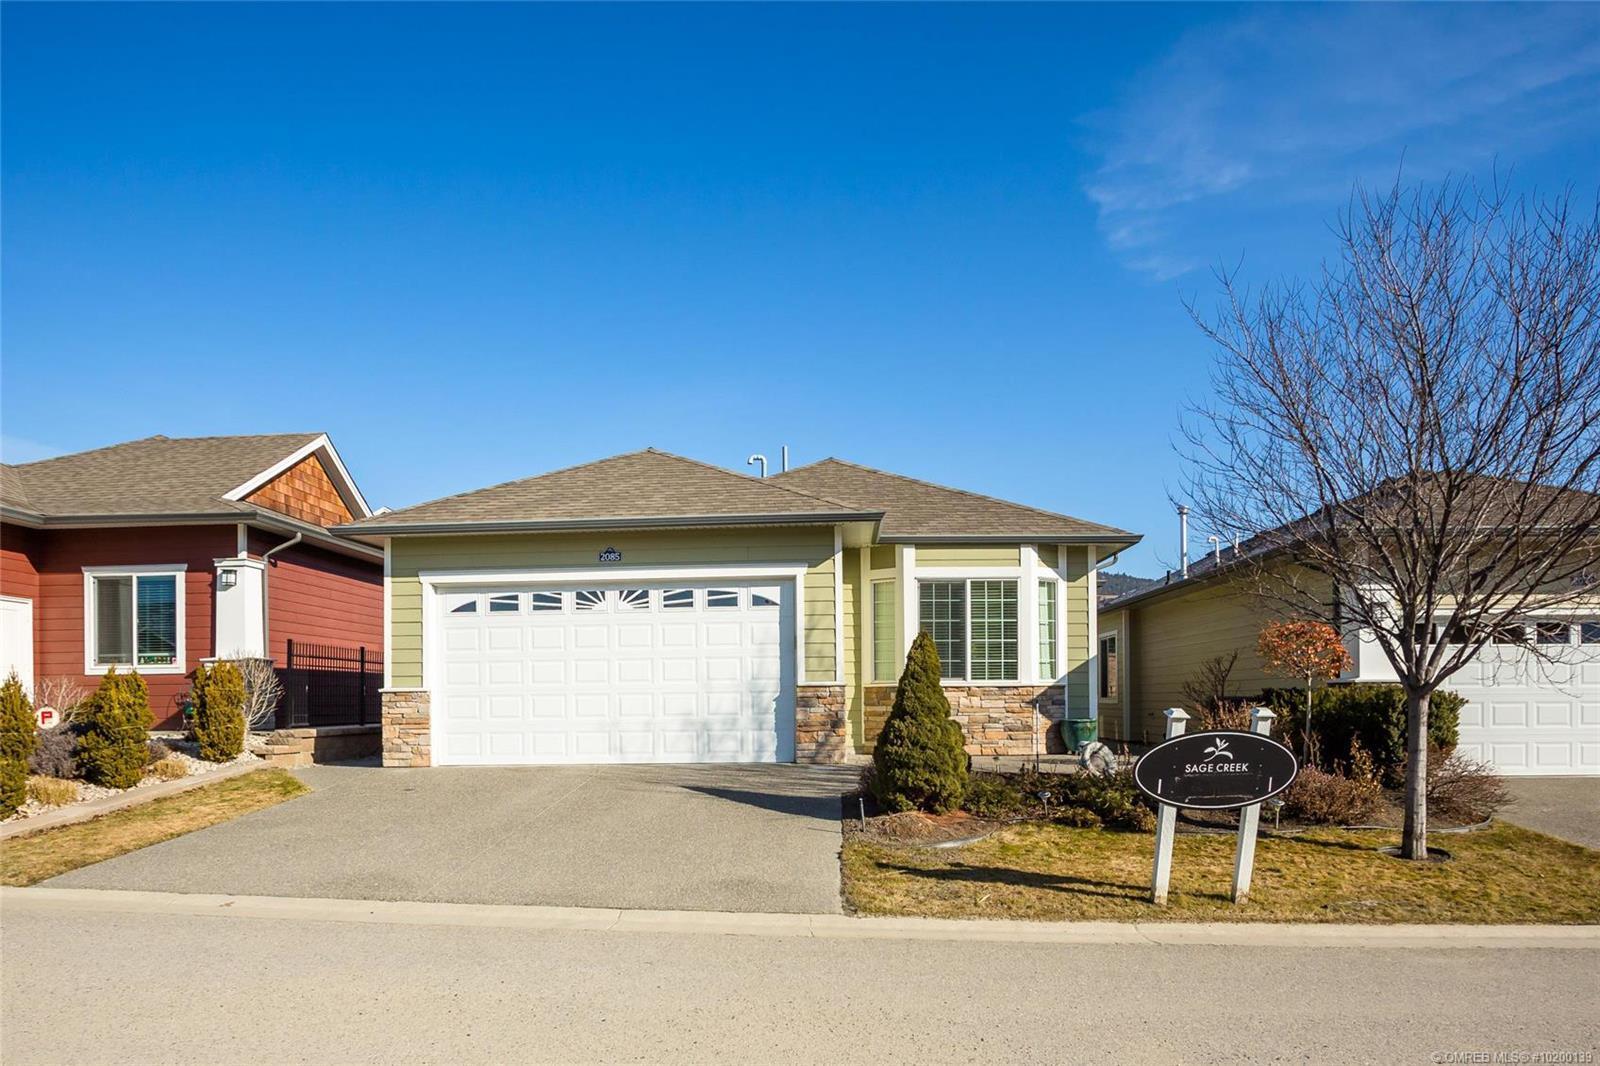 2085 Acorn Crescent,, west kelowna, British Columbia